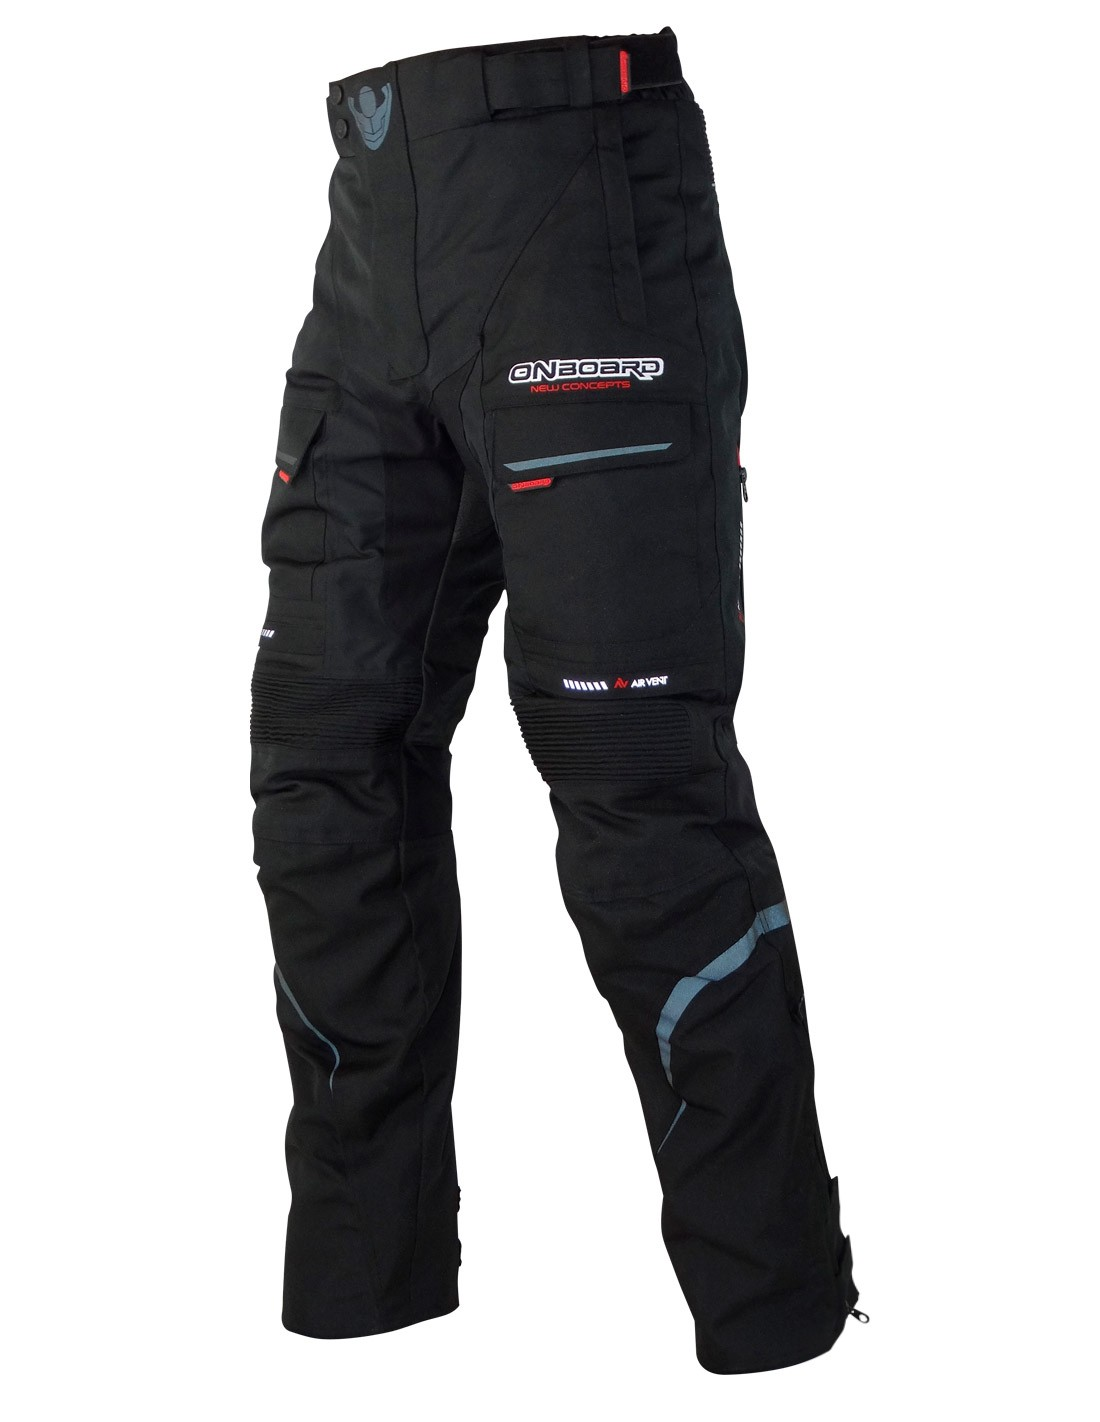 Pantalon De Moto En Cordura 100 Impermeable On Board Cruise Negro